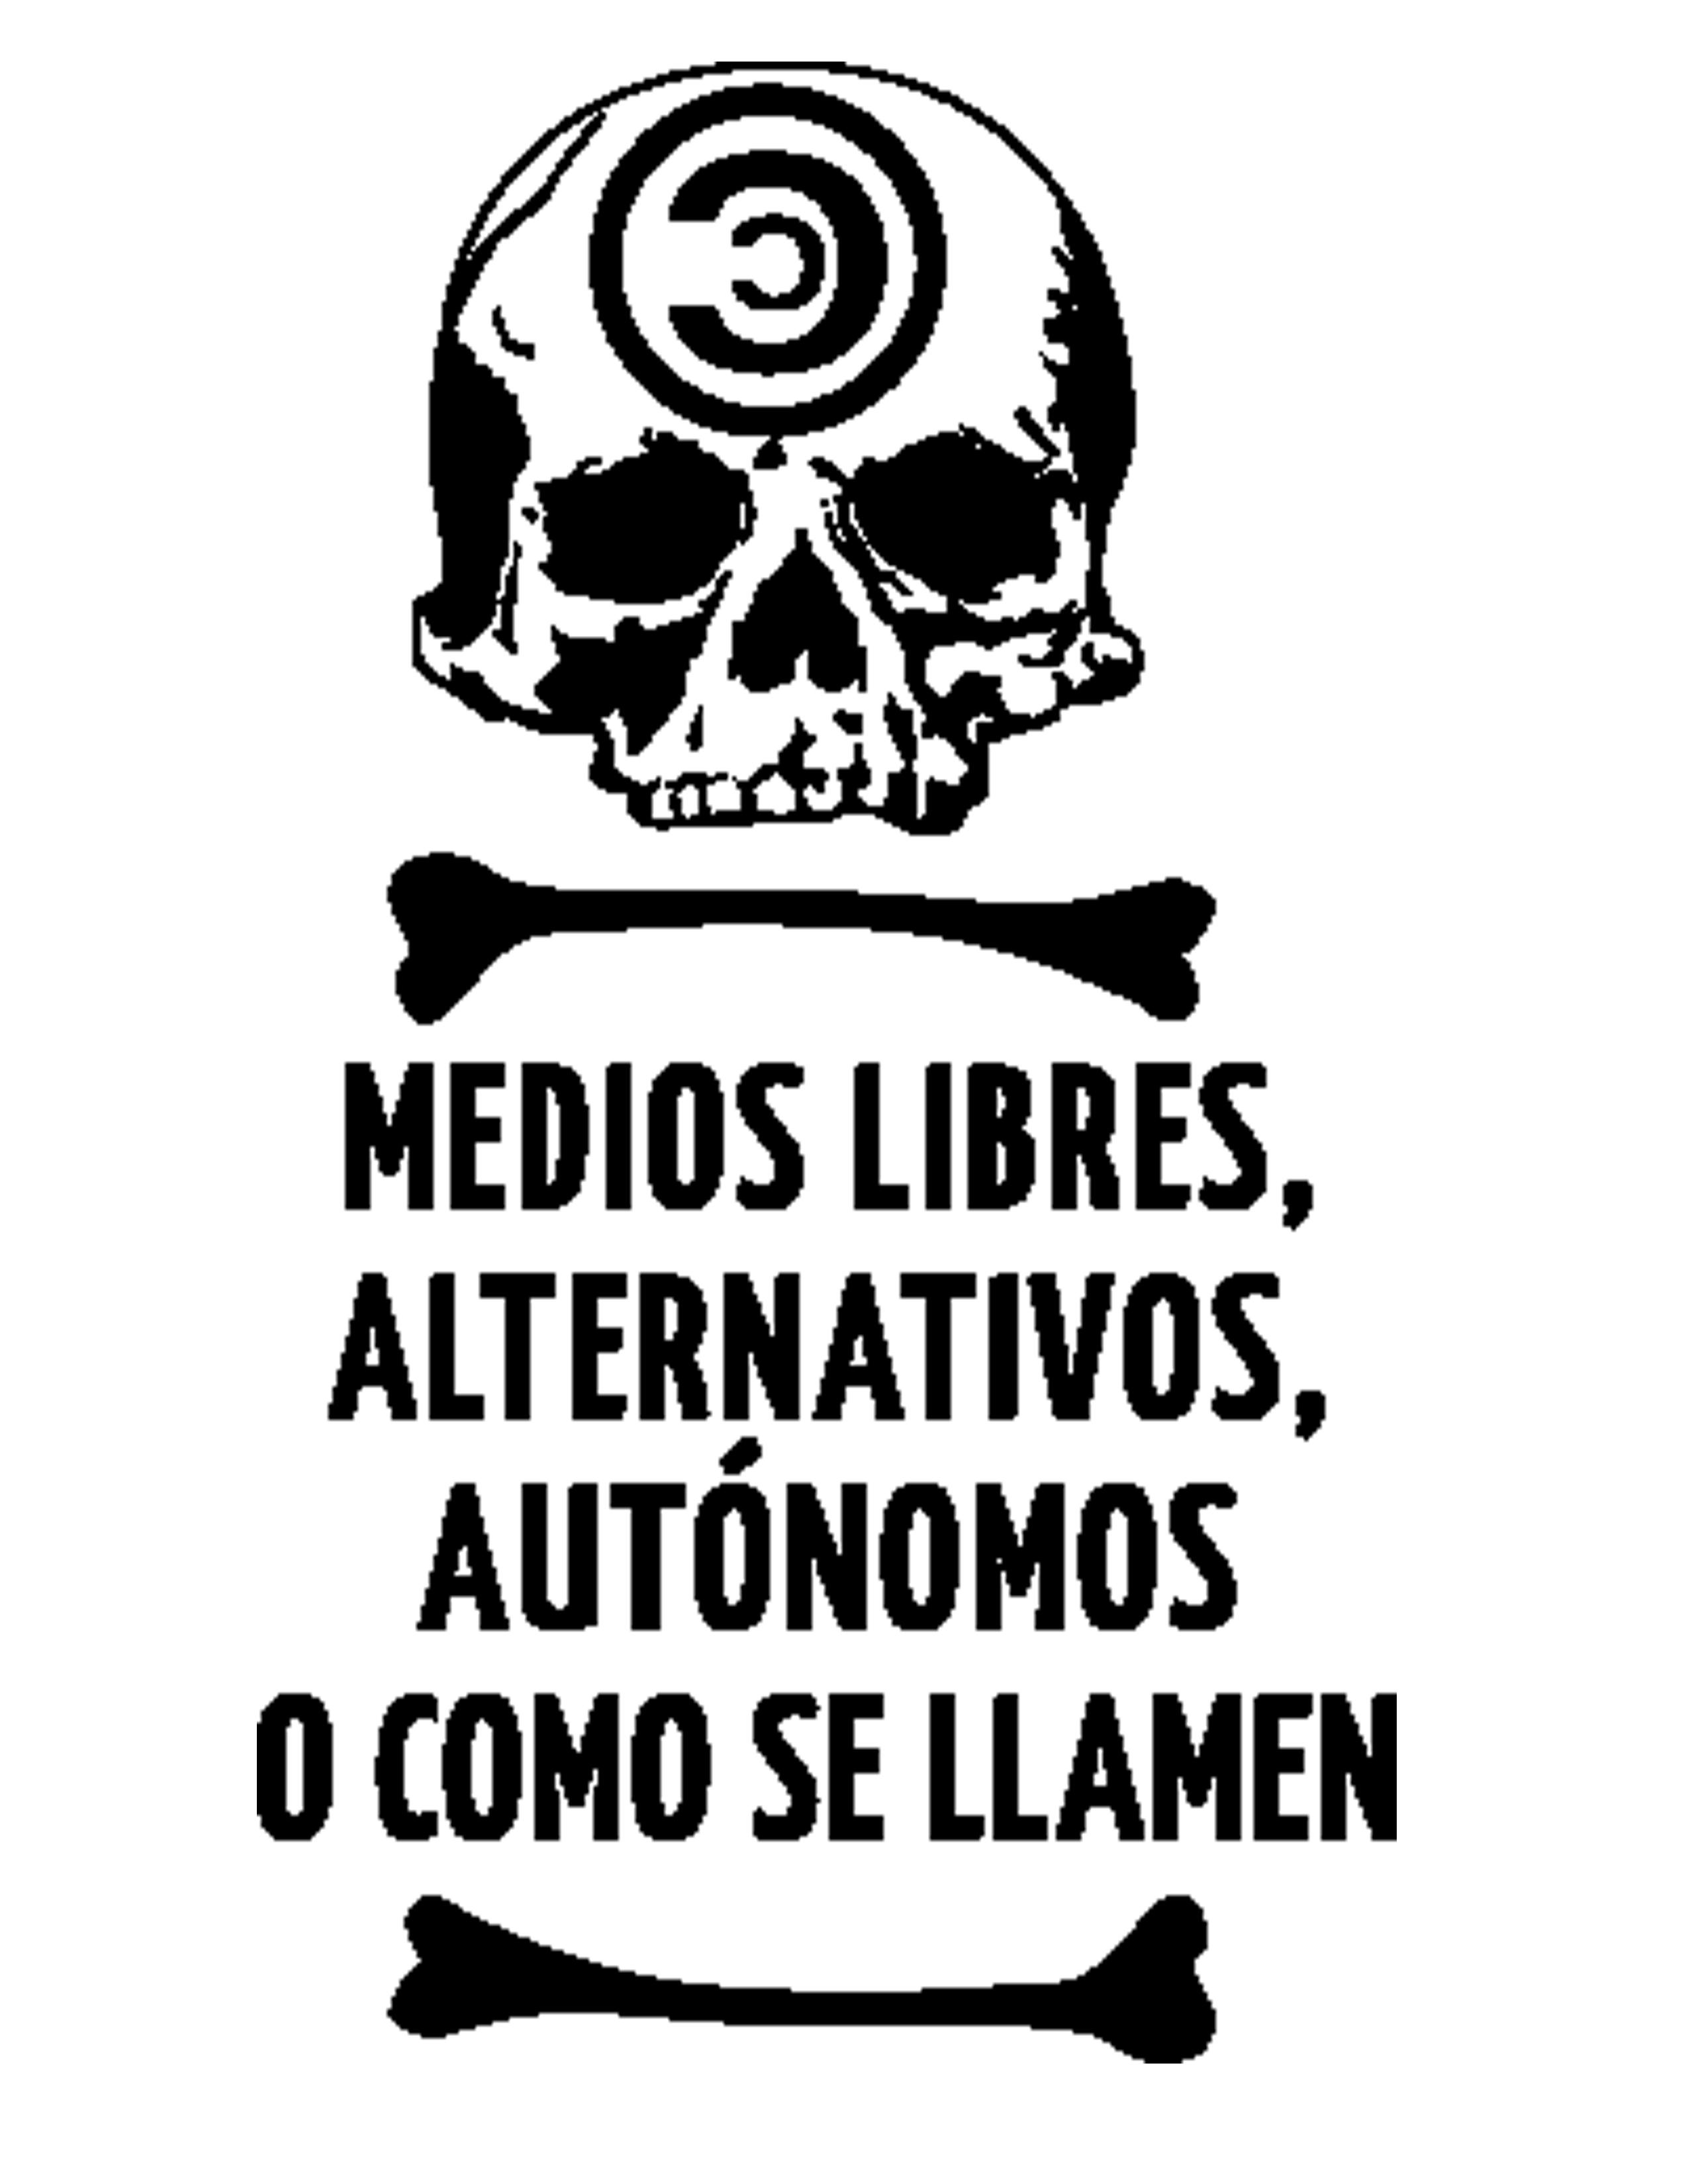 http://tejemedios.espora.org/wp-content/uploads/2014/12/MEDIOSLIB</div></body></html>